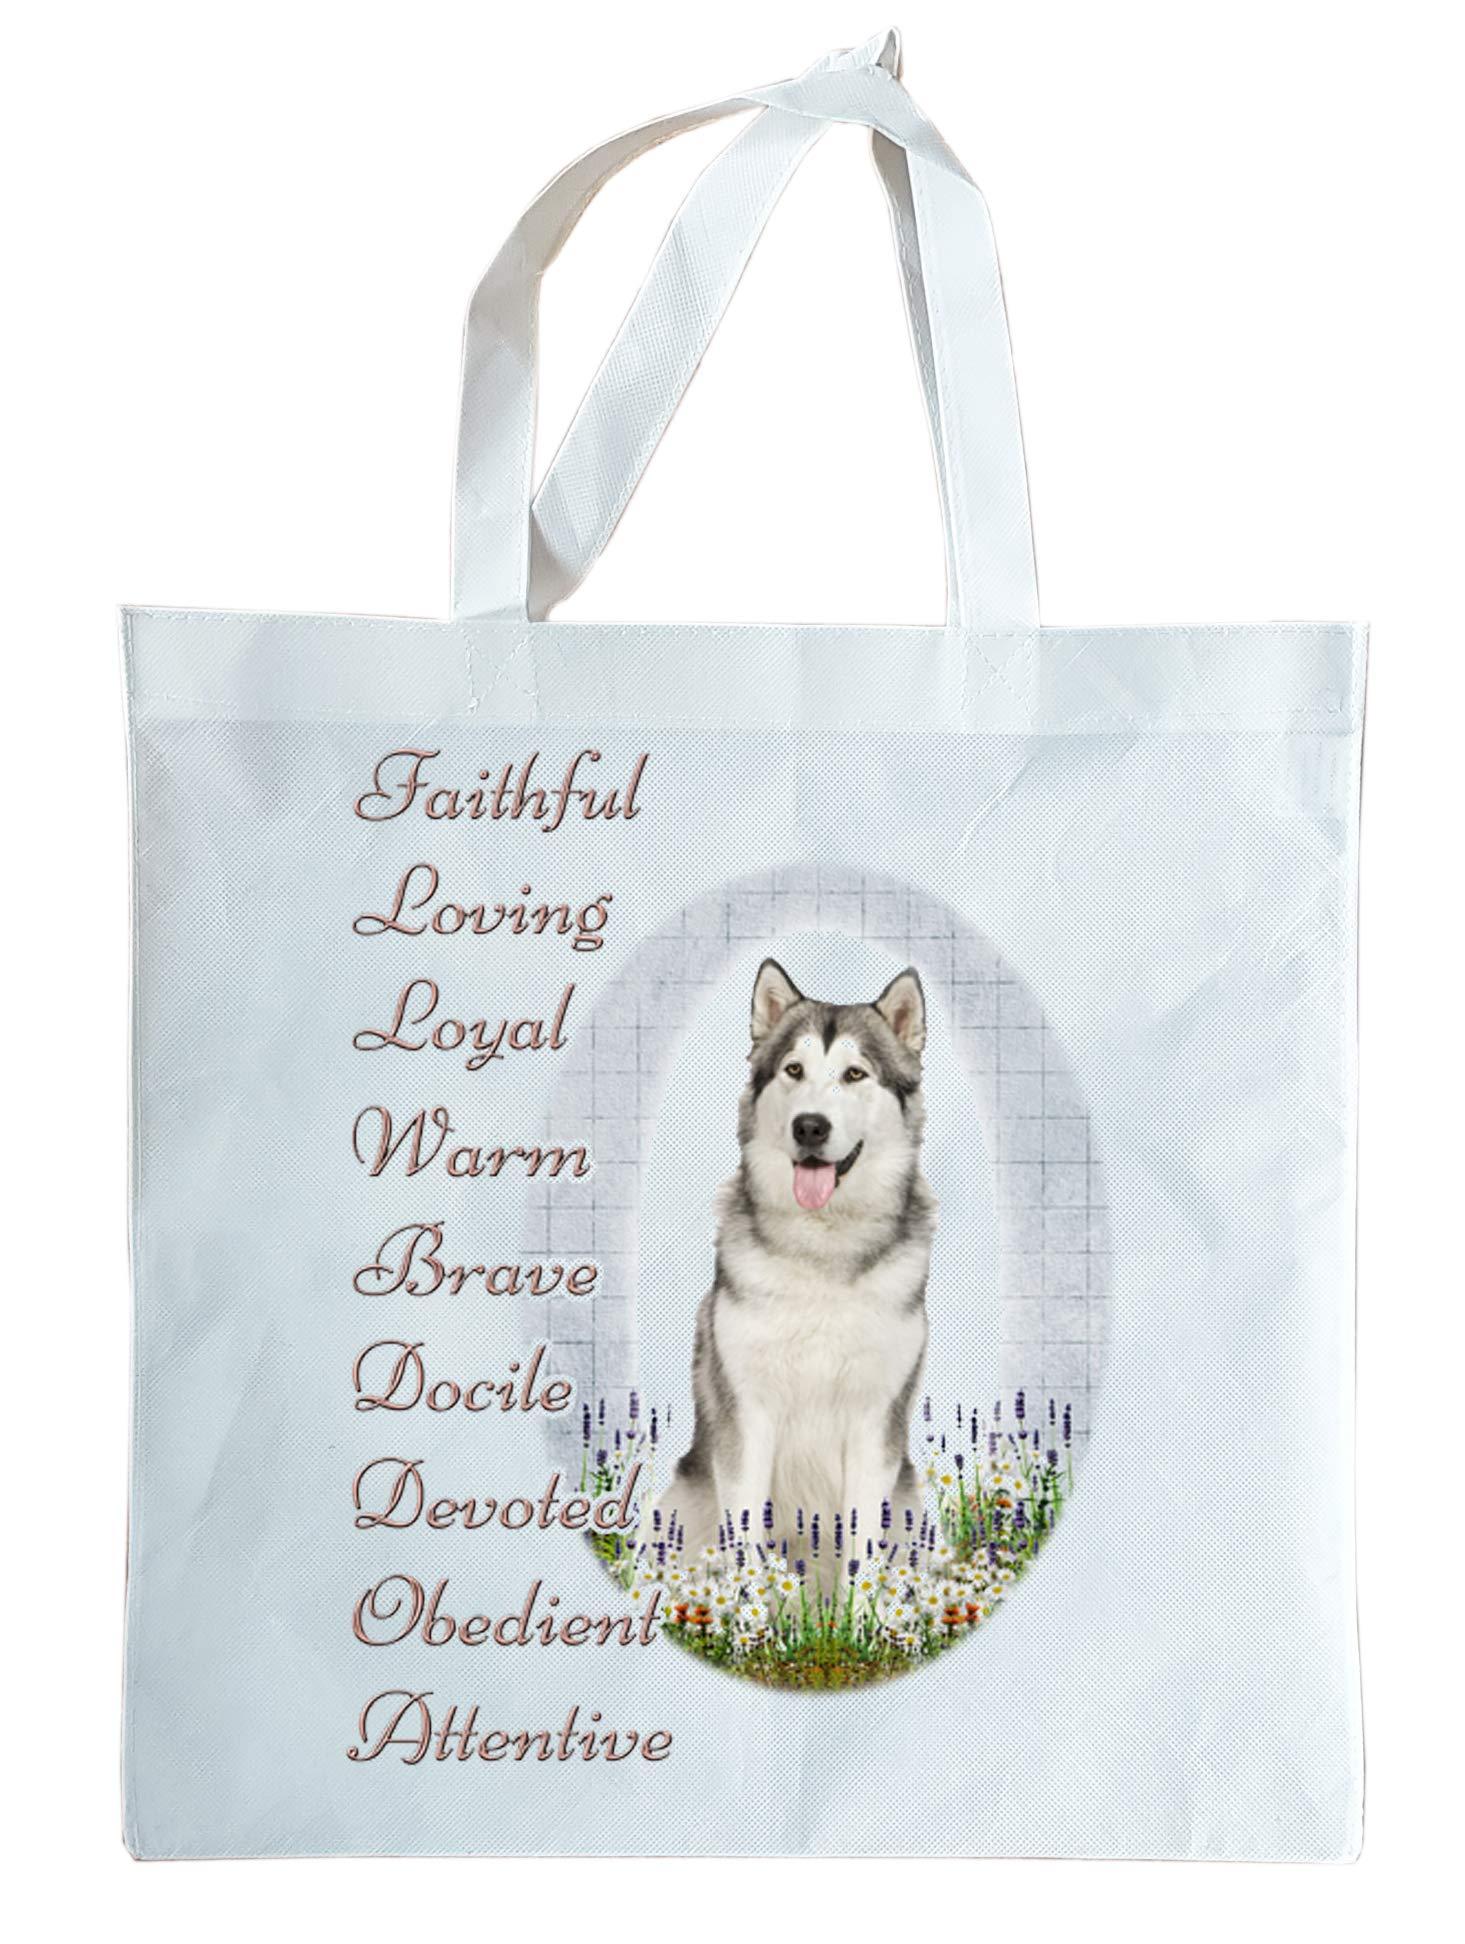 Alaskan Malamute Light Weight Gift Tote Bag Faithful, Loving Loyal. Can Be Personalised.